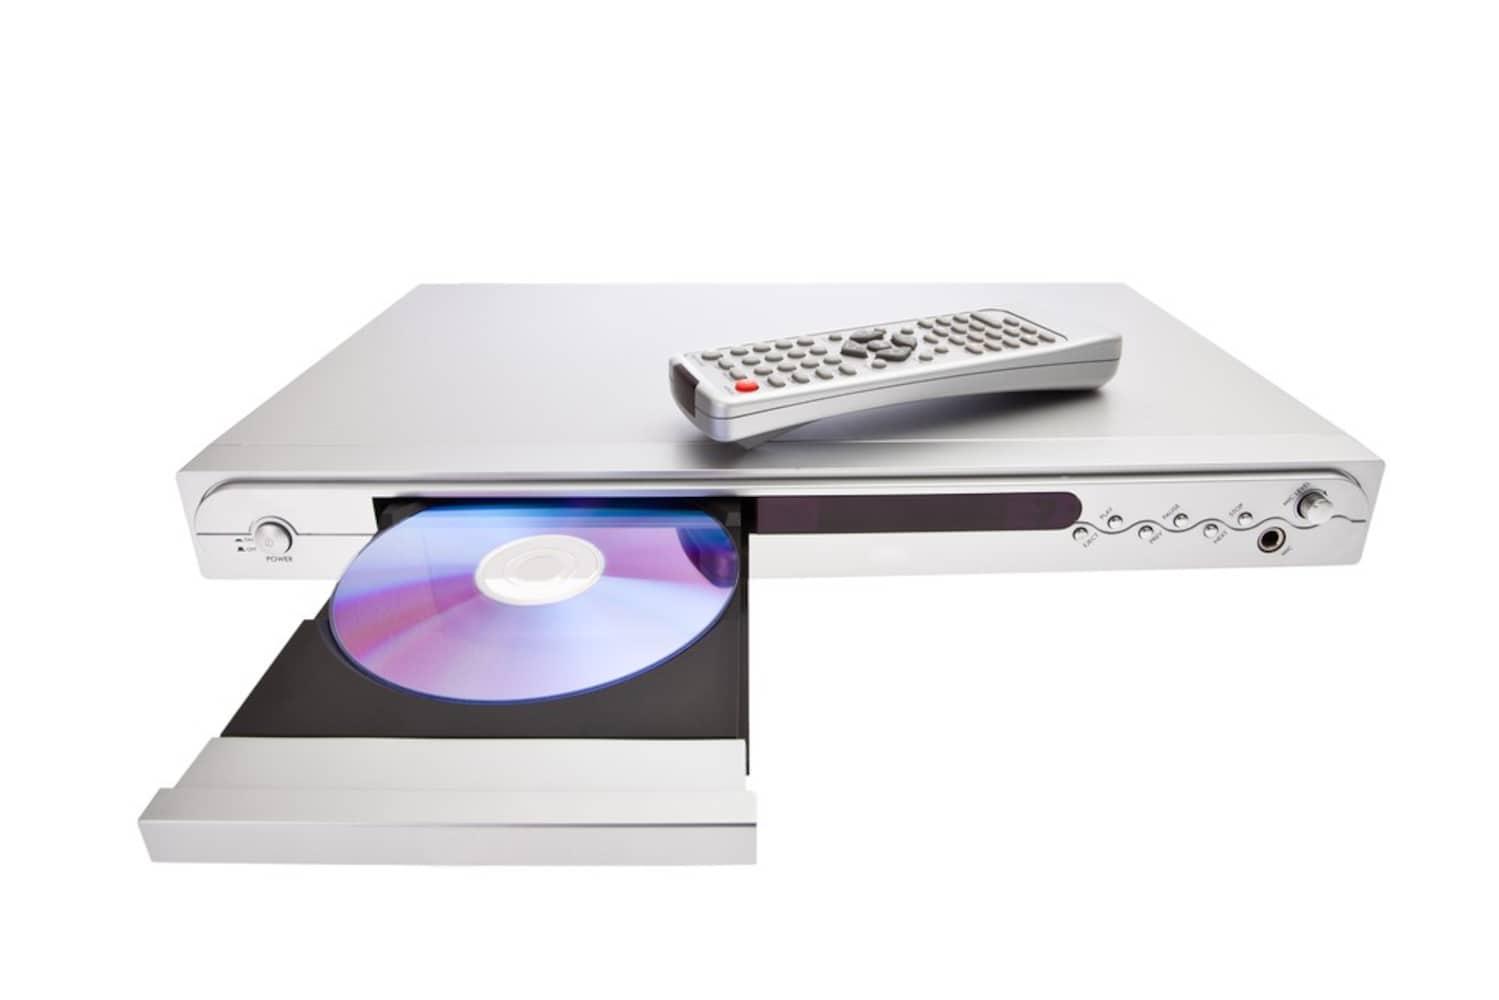 HDD容量|録り溜め派は1TB以上を目安に